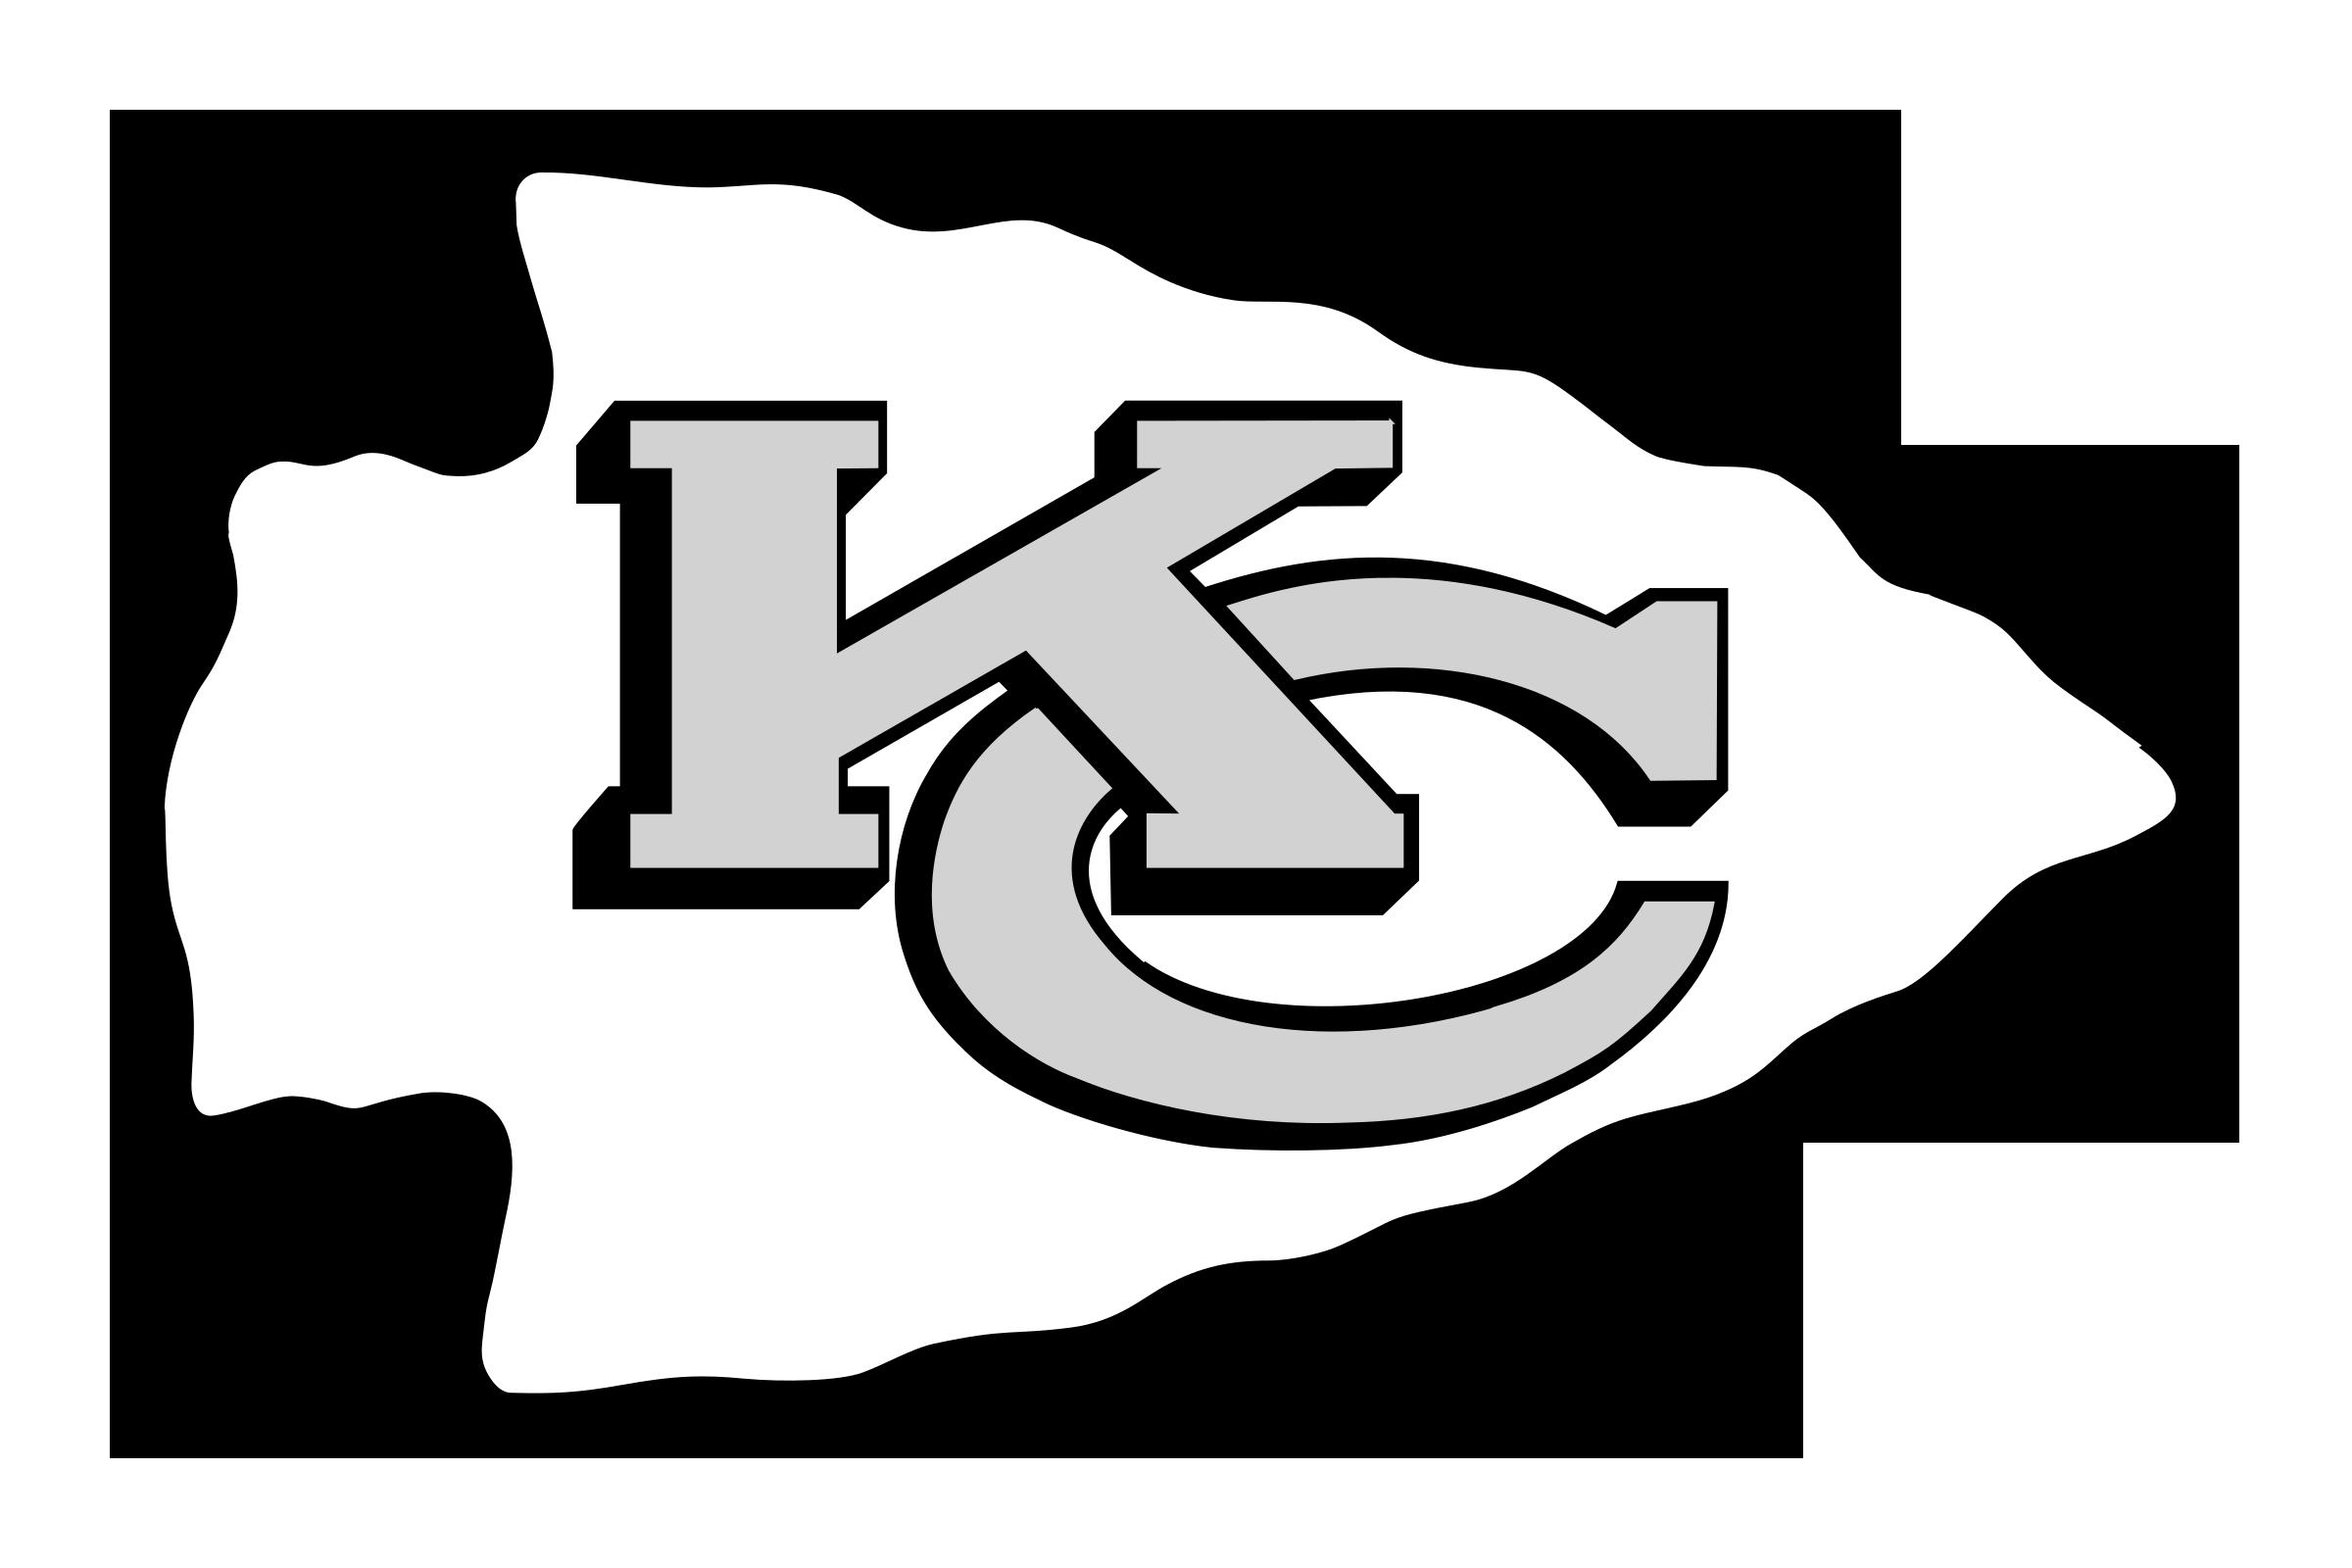 Kansas City Chiefs Logo Black And White - Kansas City Chiefs, Transparent background PNG HD thumbnail